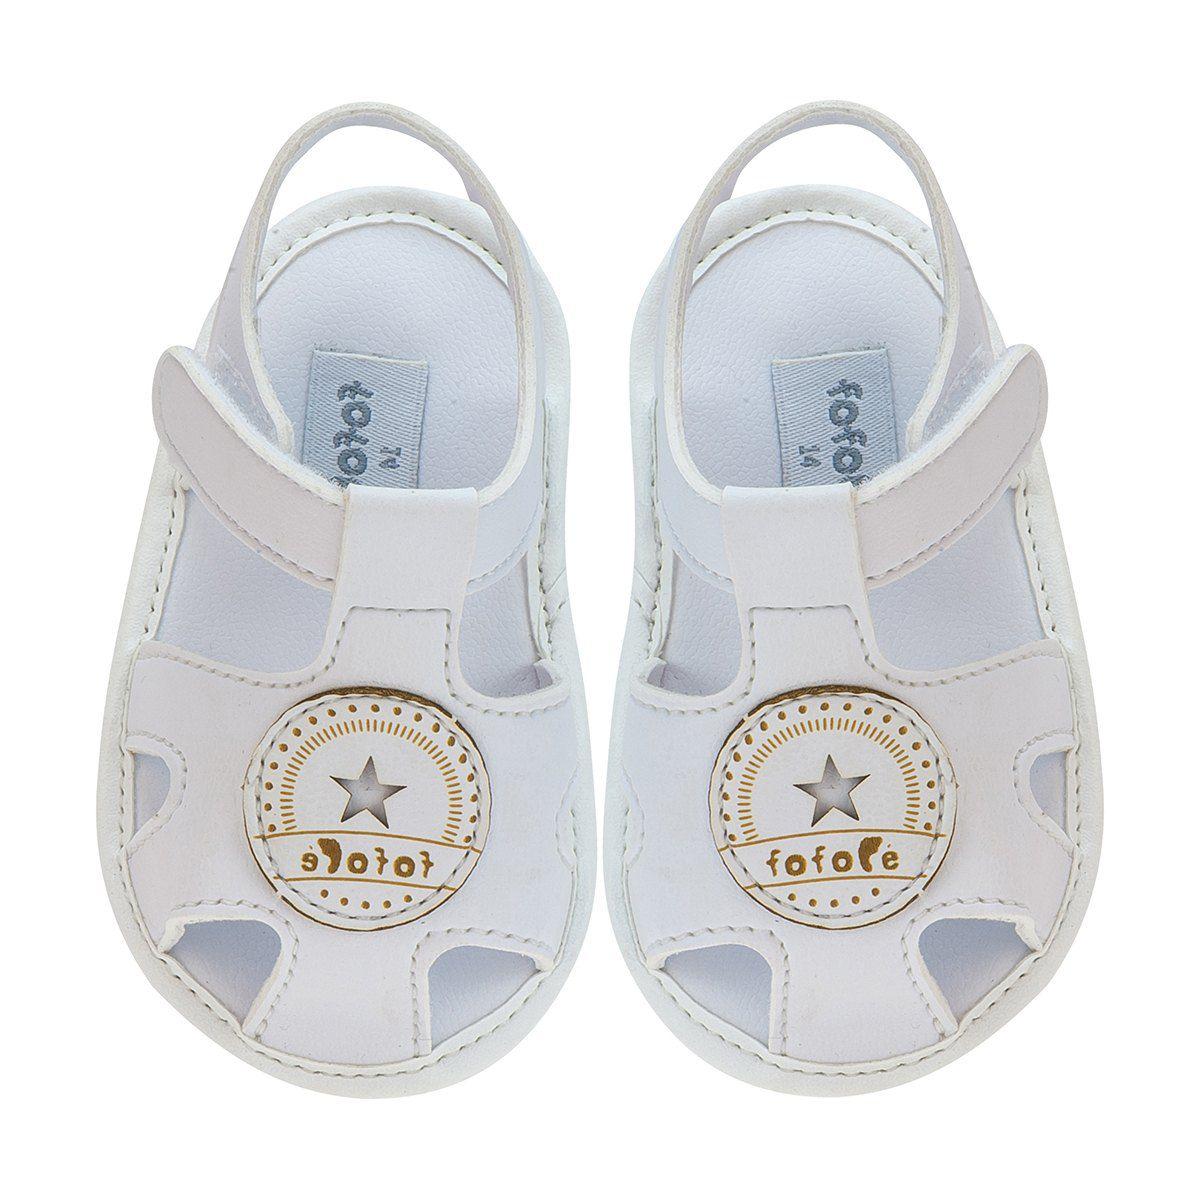 Sandália Bebê Masculina Velcro Branco - FOFOPÉ